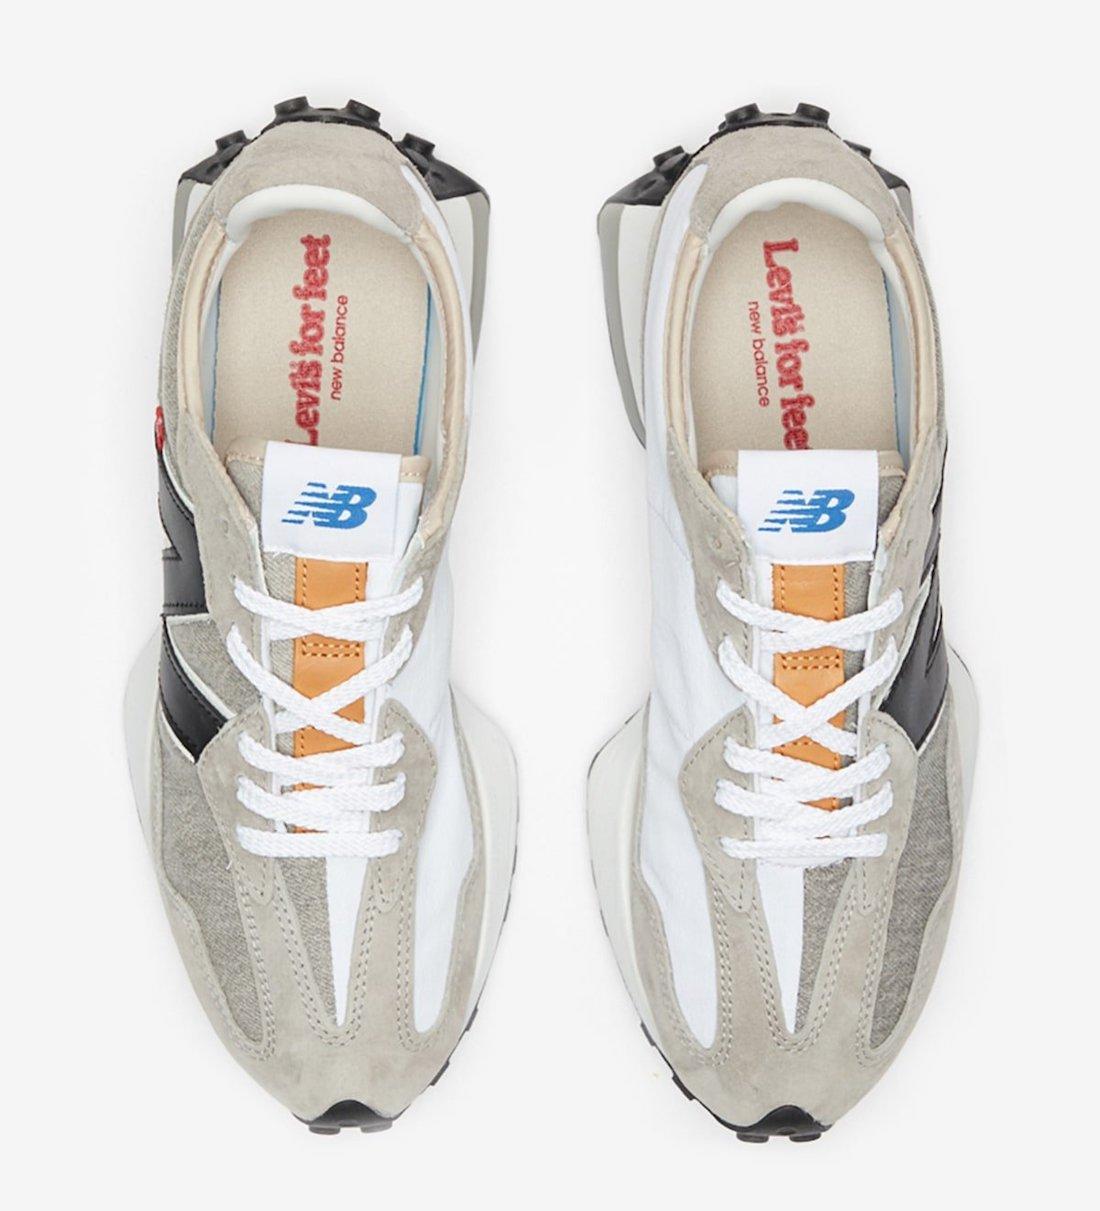 giày thể thao NEW BALANCE 327 x LEVI'S beige